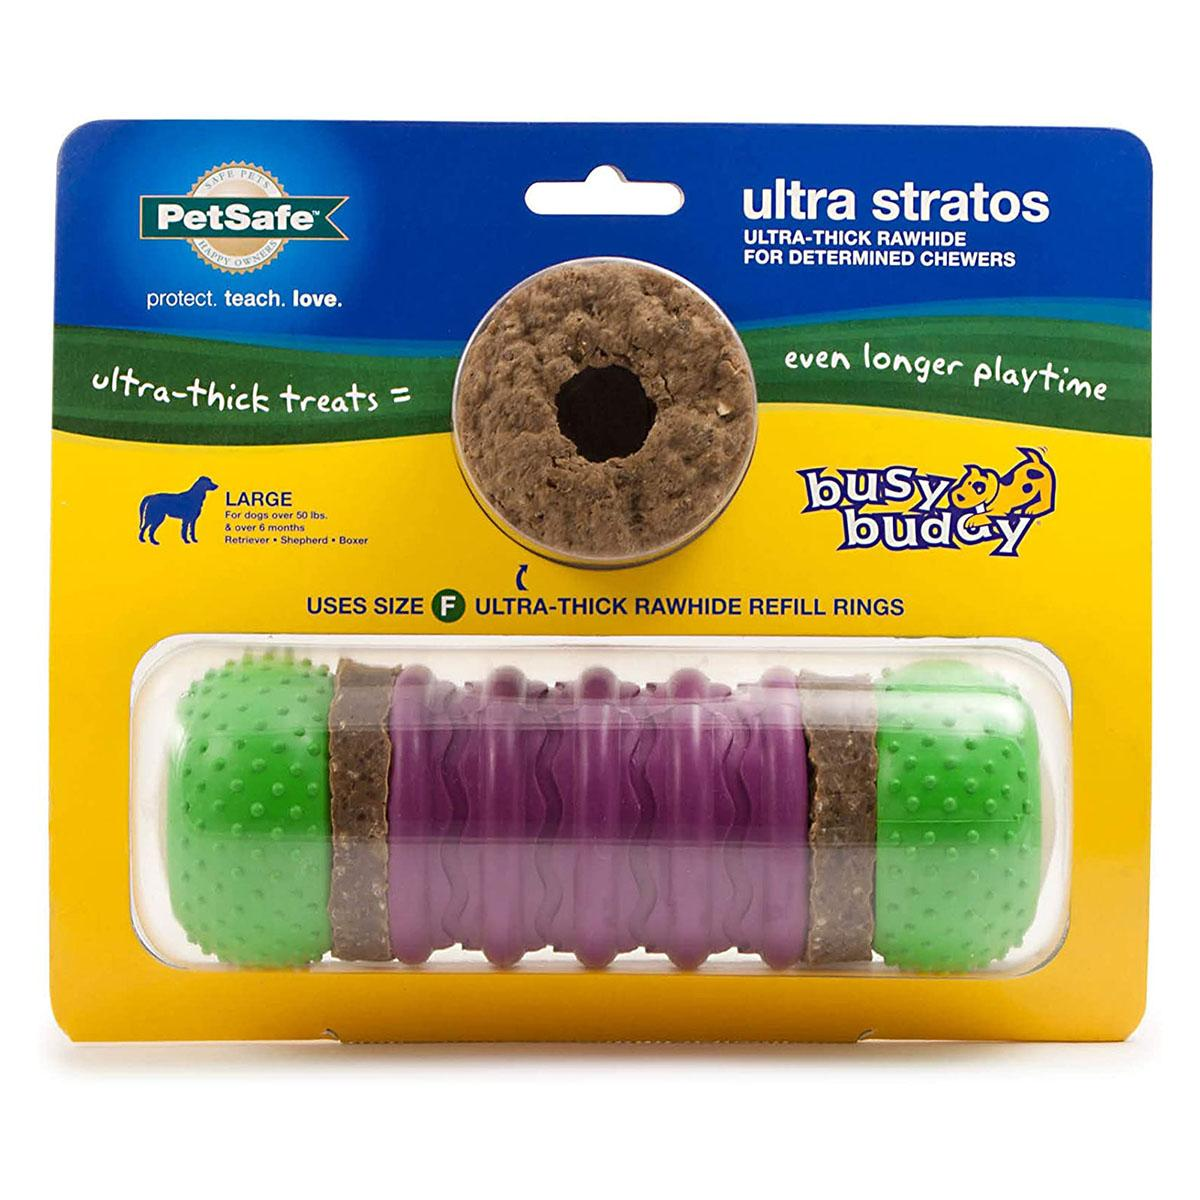 Busy Buddy Ultra Stratos Dog Toy